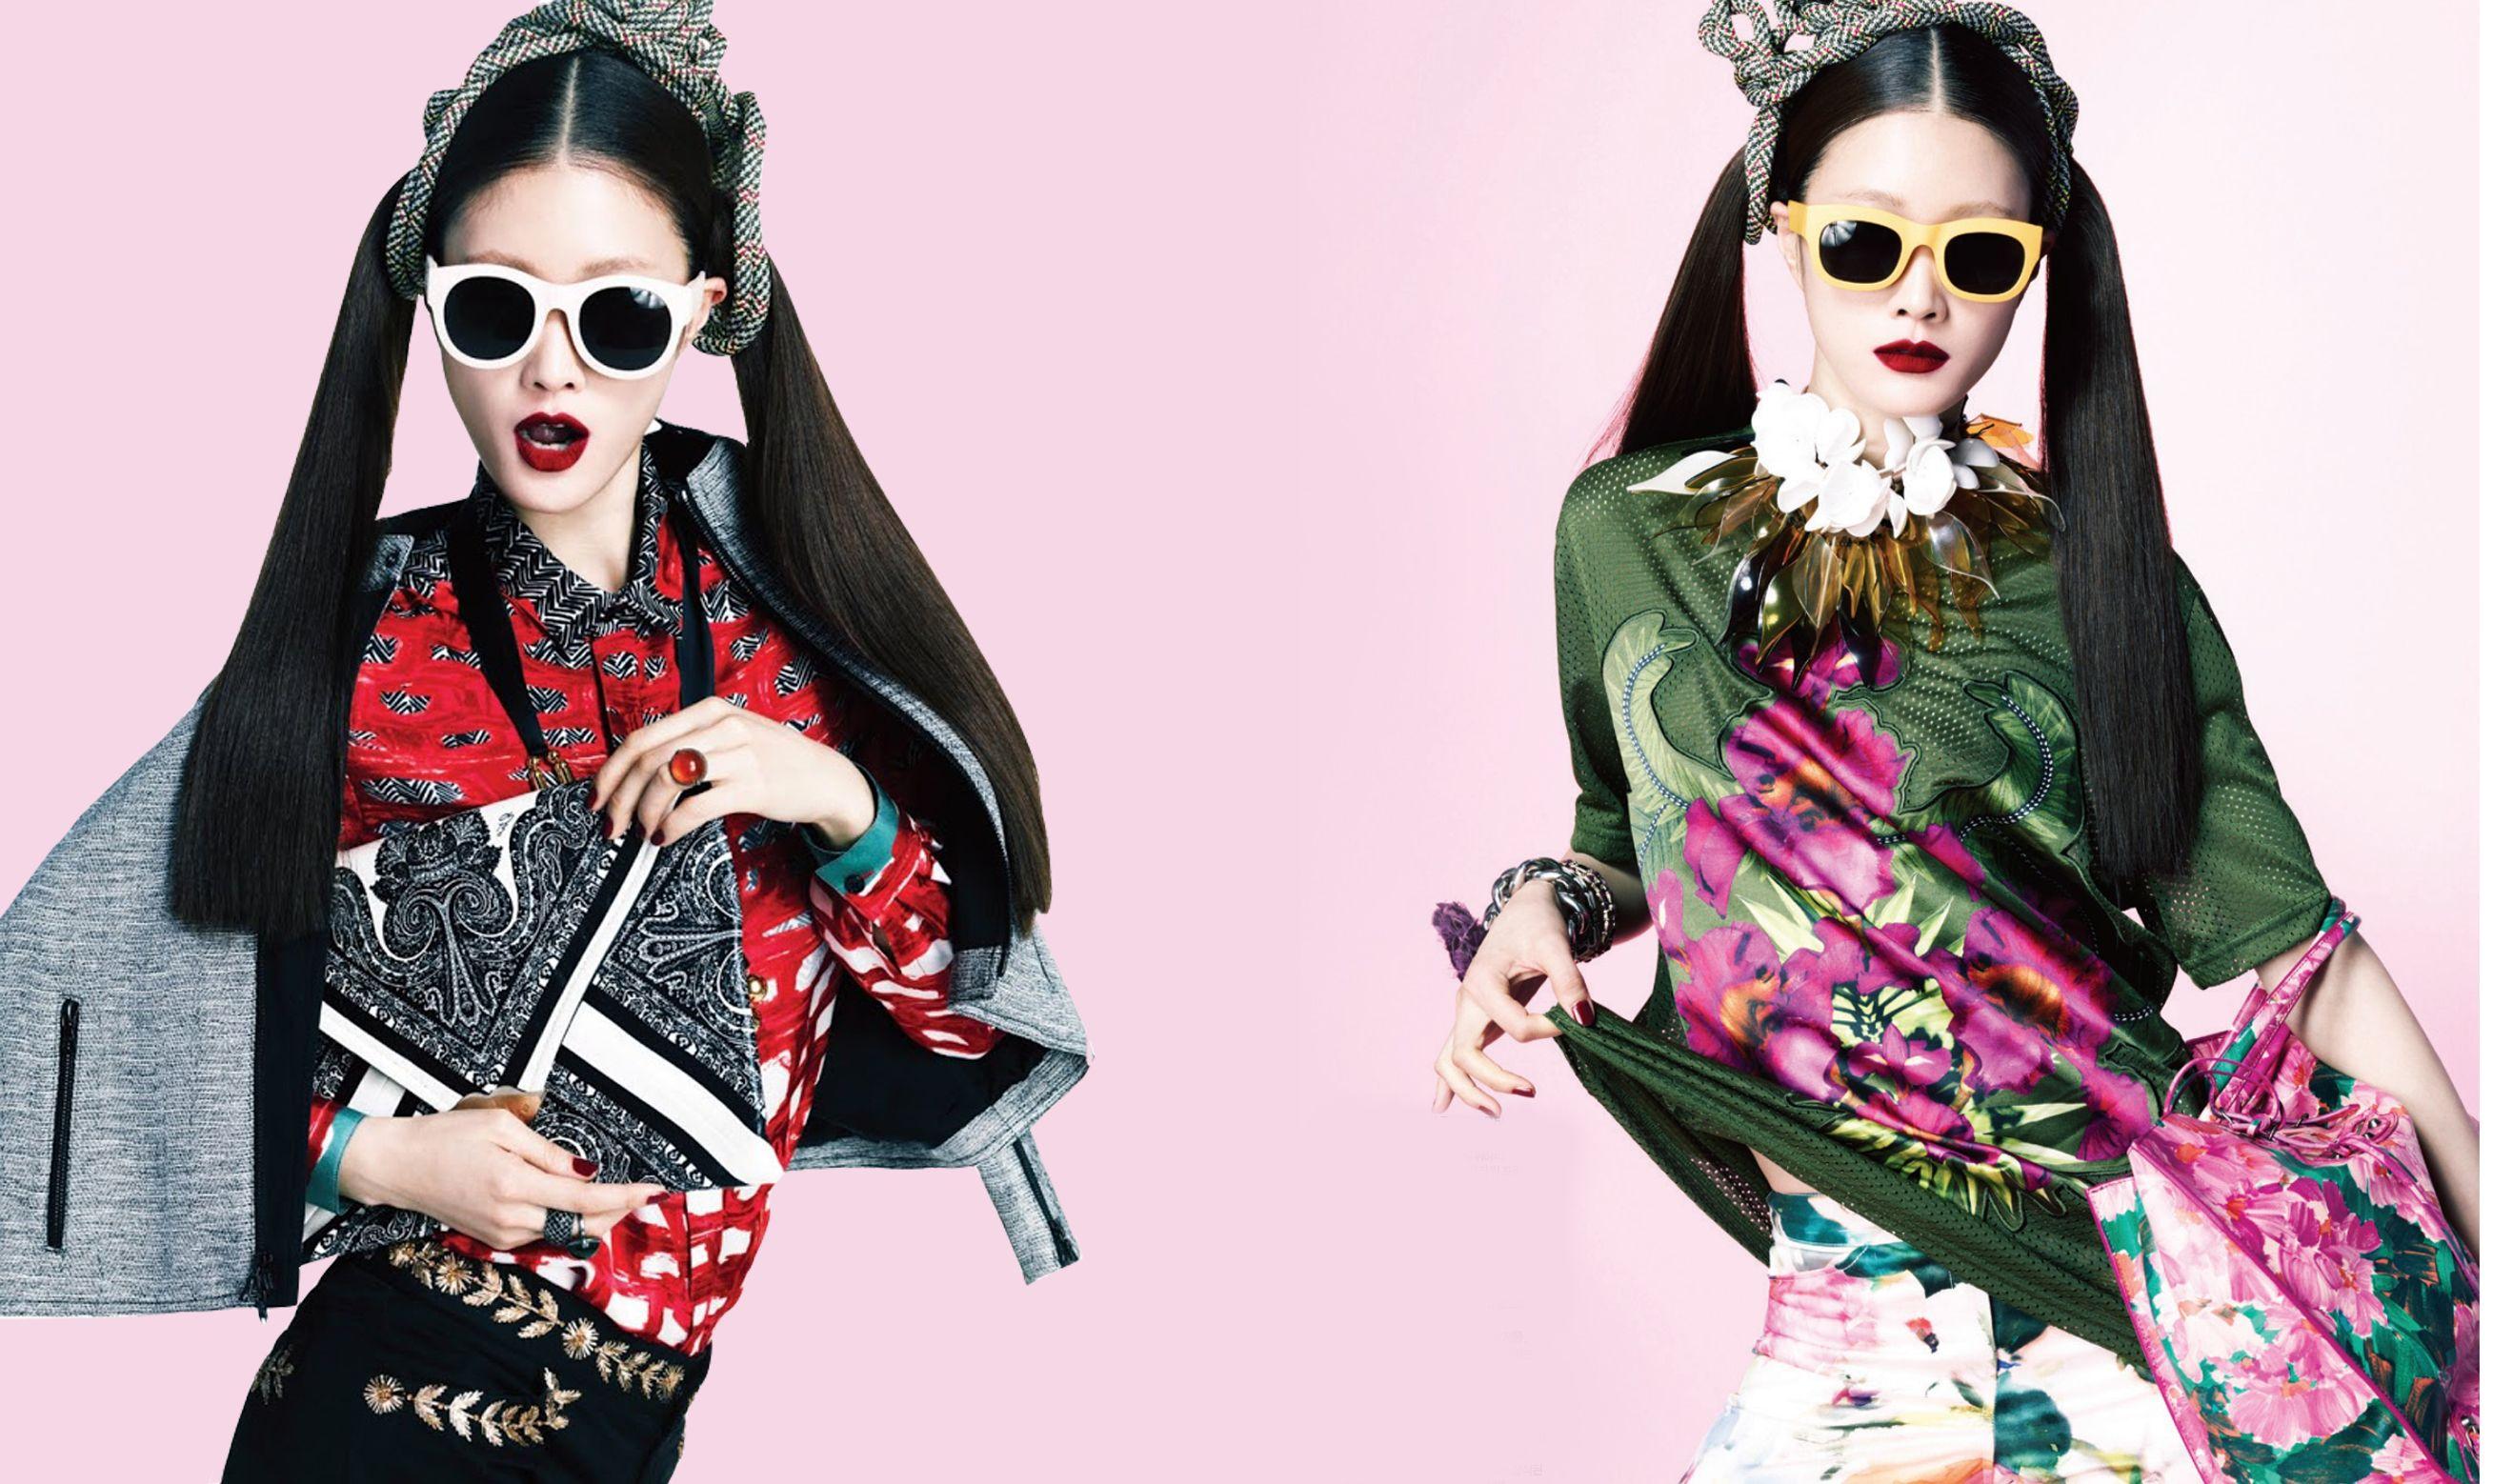 #photography #fashion #editorial #mode #model #beauty #shooting